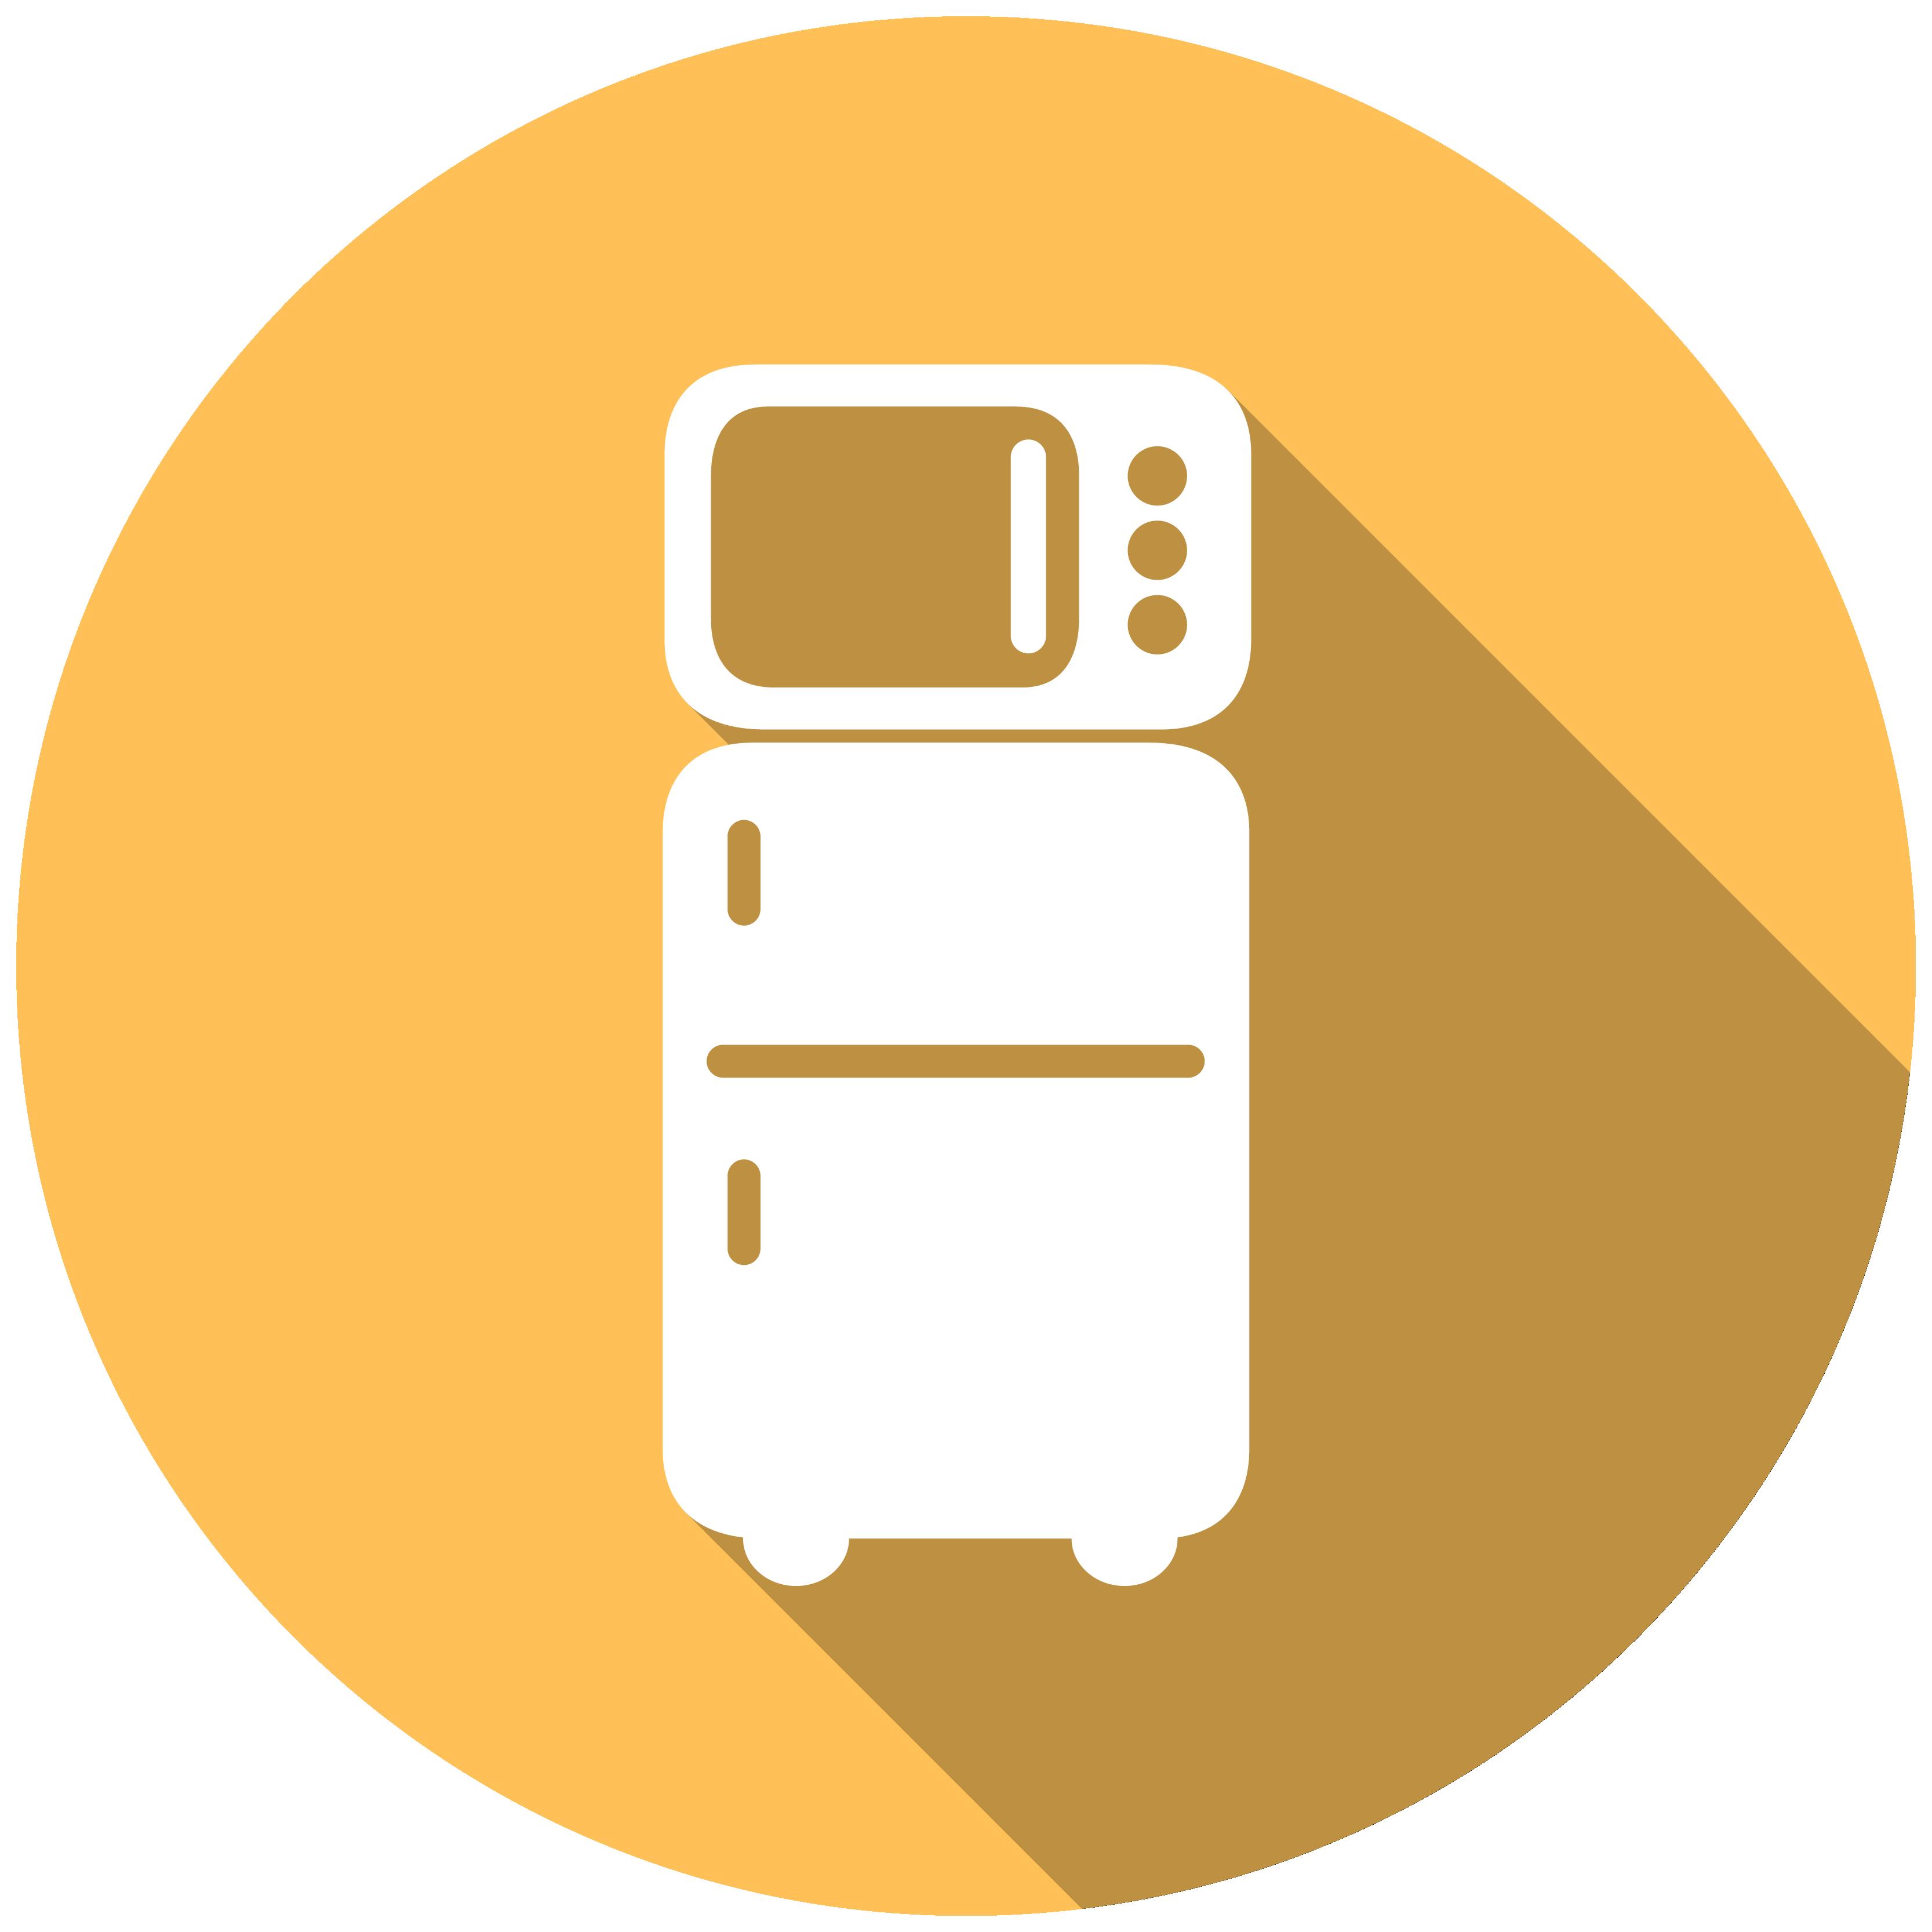 Refrigerator clipart mini fridge. Microwave rental icon housing